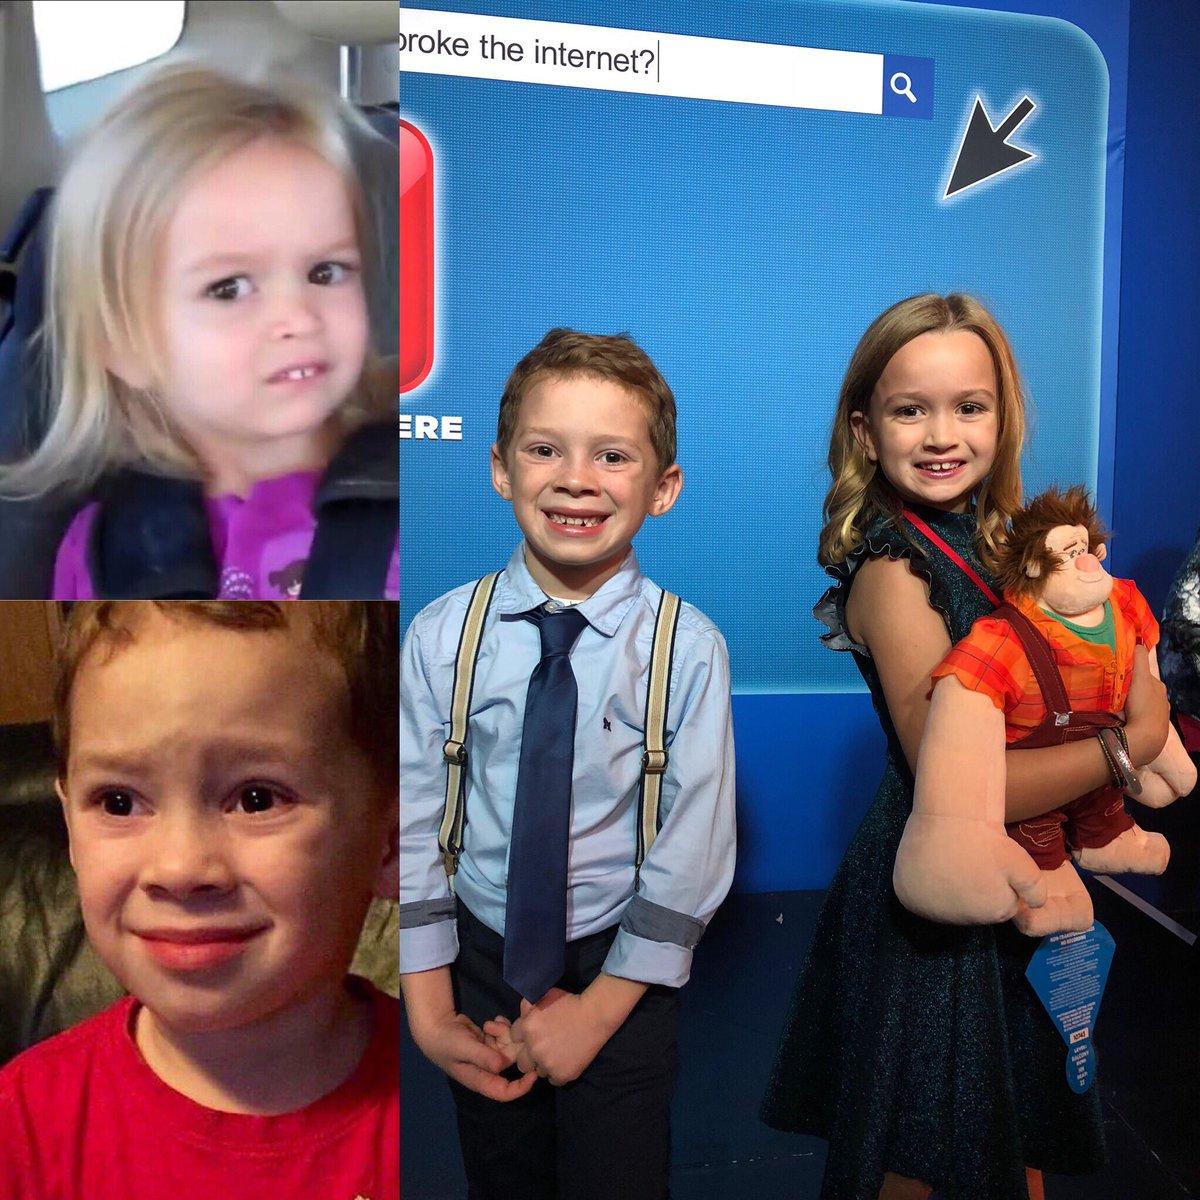 Chloe and Gavin break the internet! #ralphbreakstheinternet @DisneyStudios